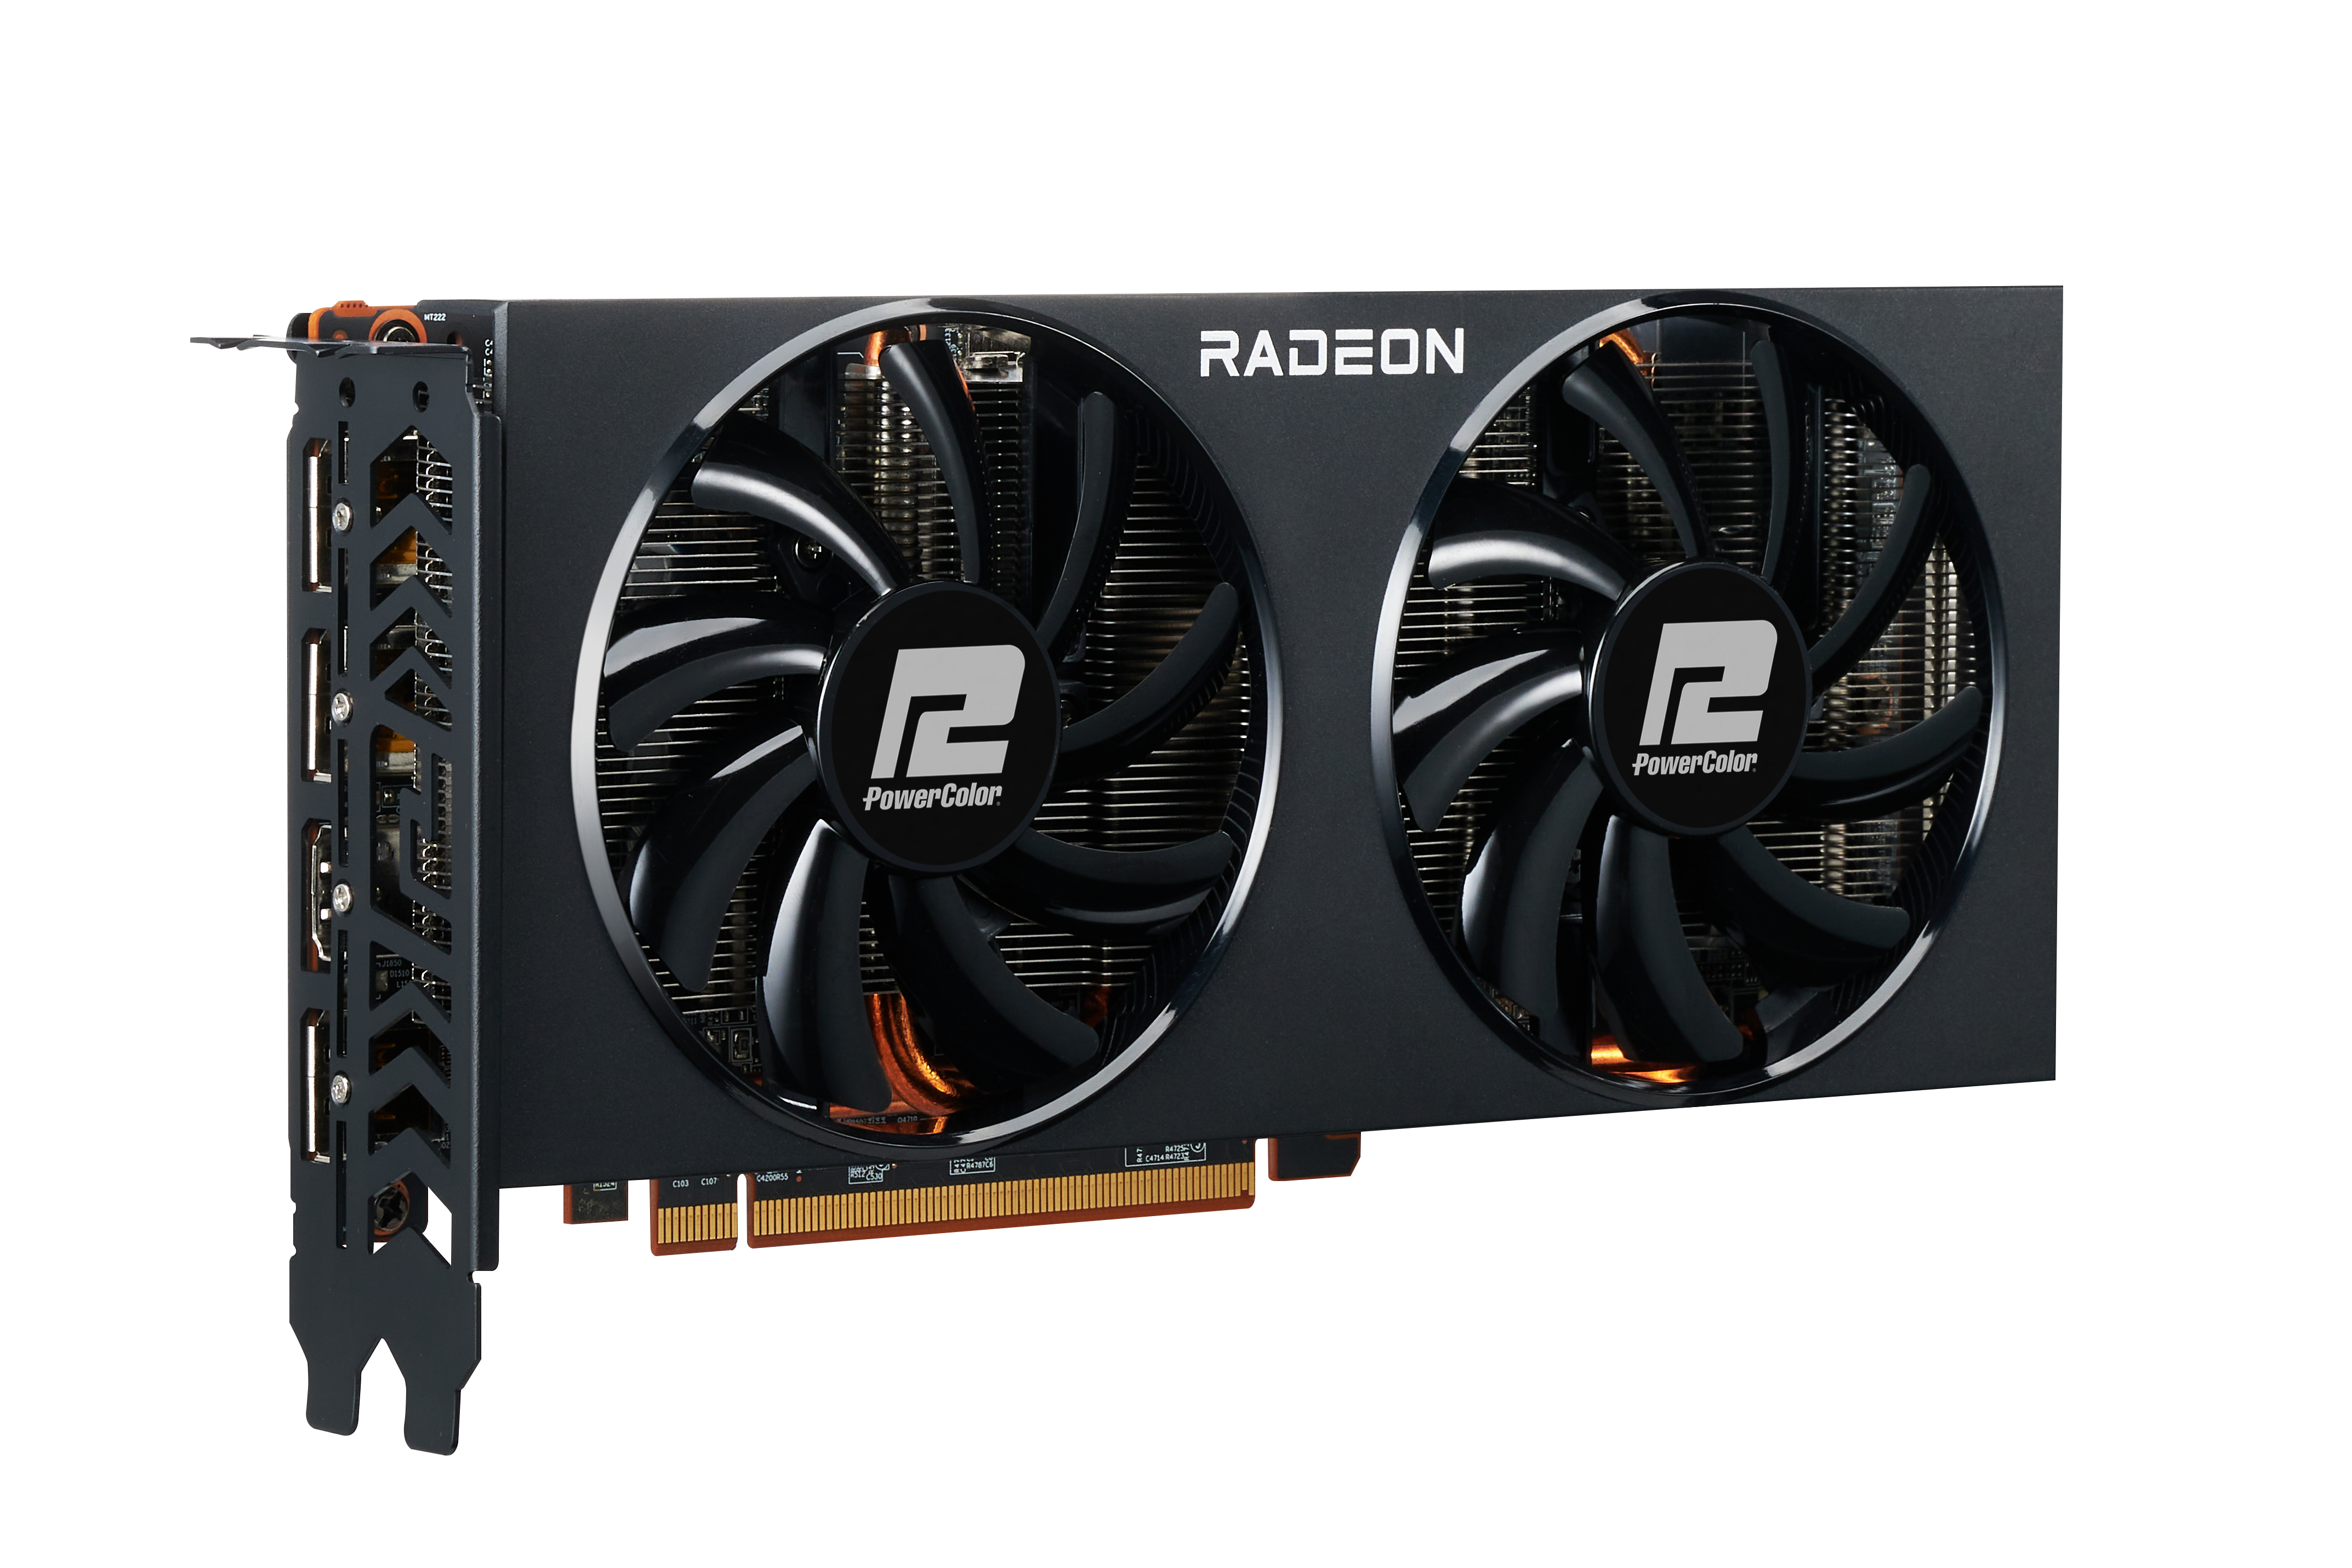 PowerColor AXRX 6700XT 12GBD6-3DH - Radeon RX 6700 XT - 12 GB - GDDR6 - 192 Bit - PCI Express 4.0 - 2 Lüfter